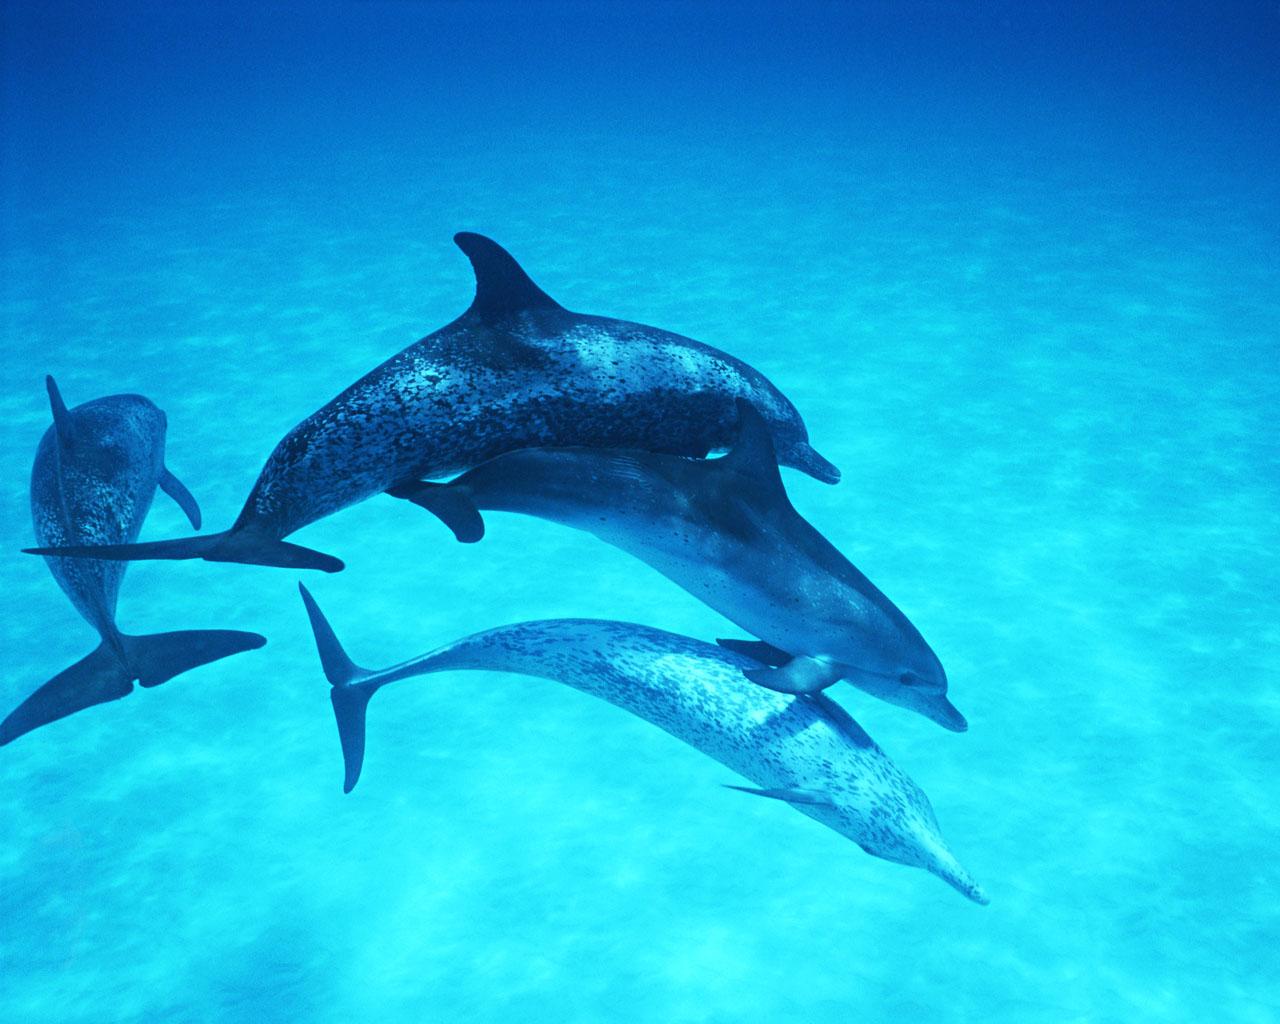 Dolphin Wallpaper HQ ~ Taste Wallpapers